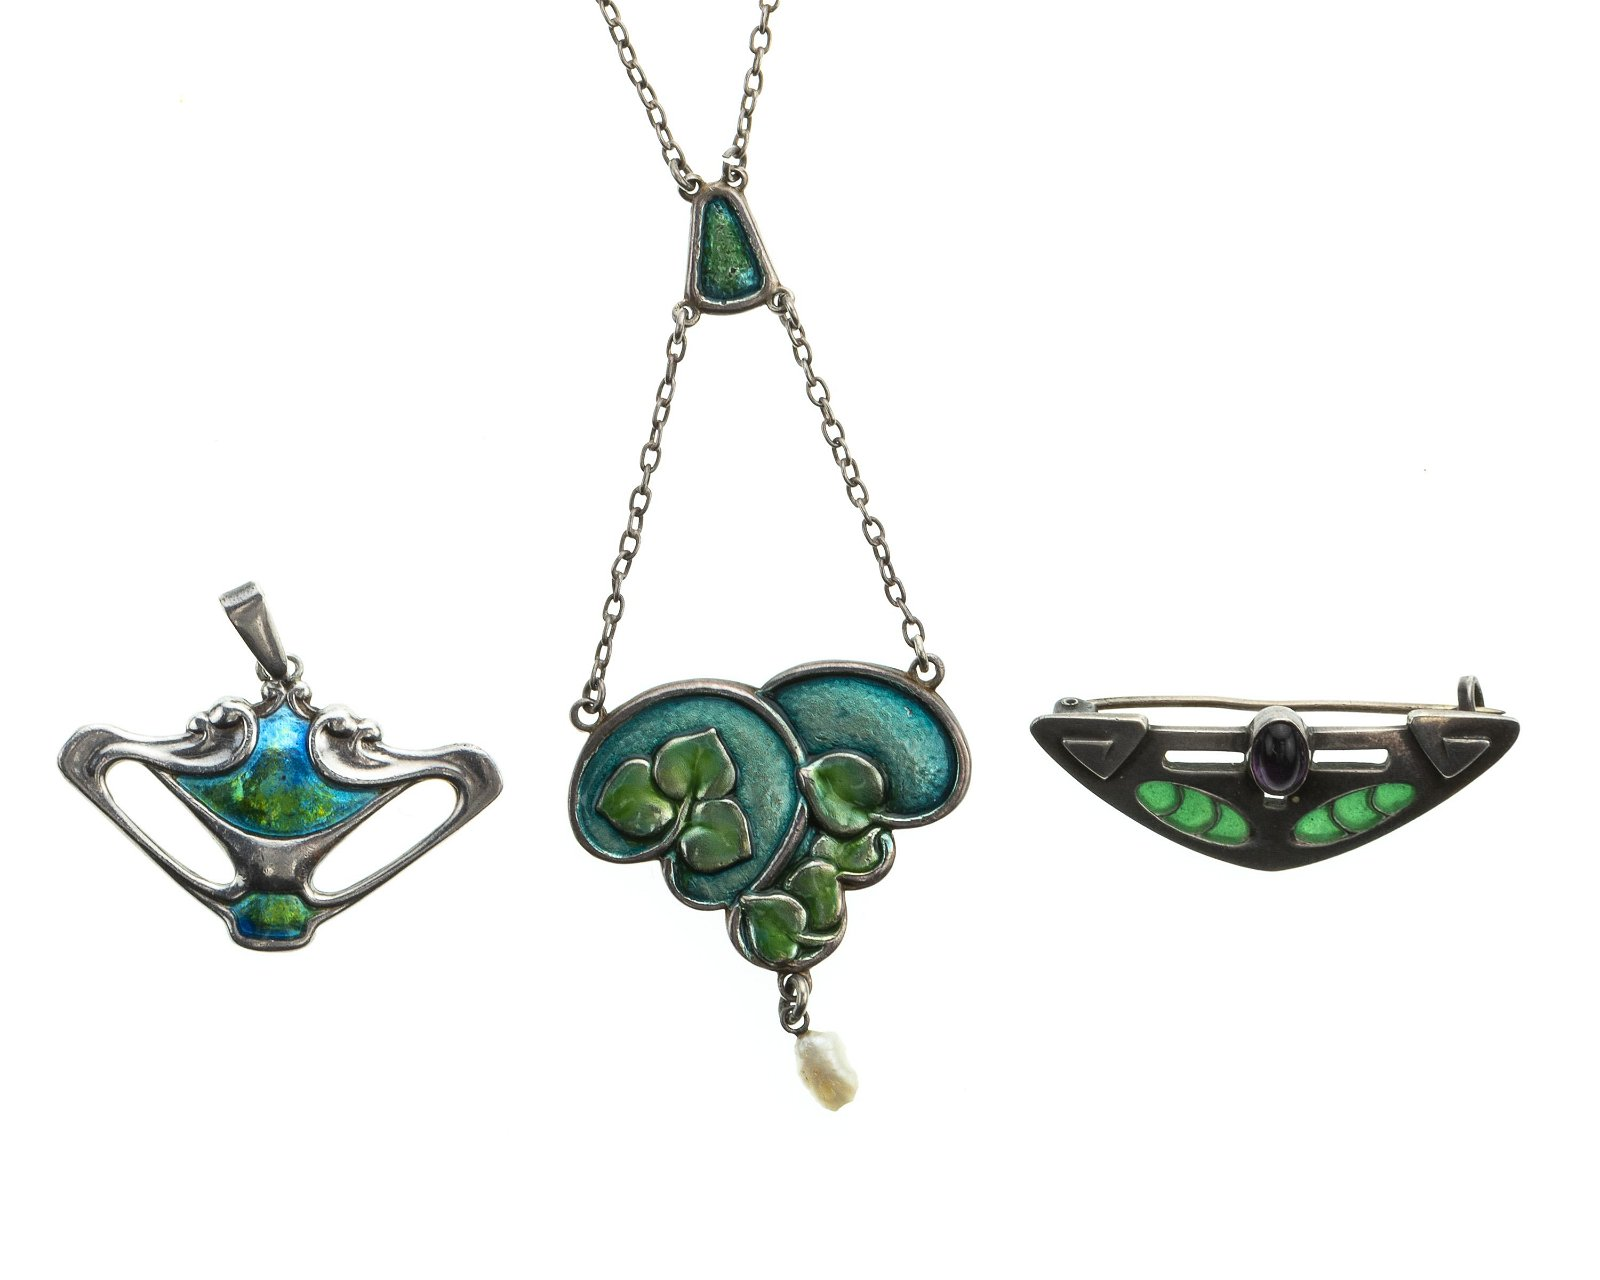 Three silver jewelry items